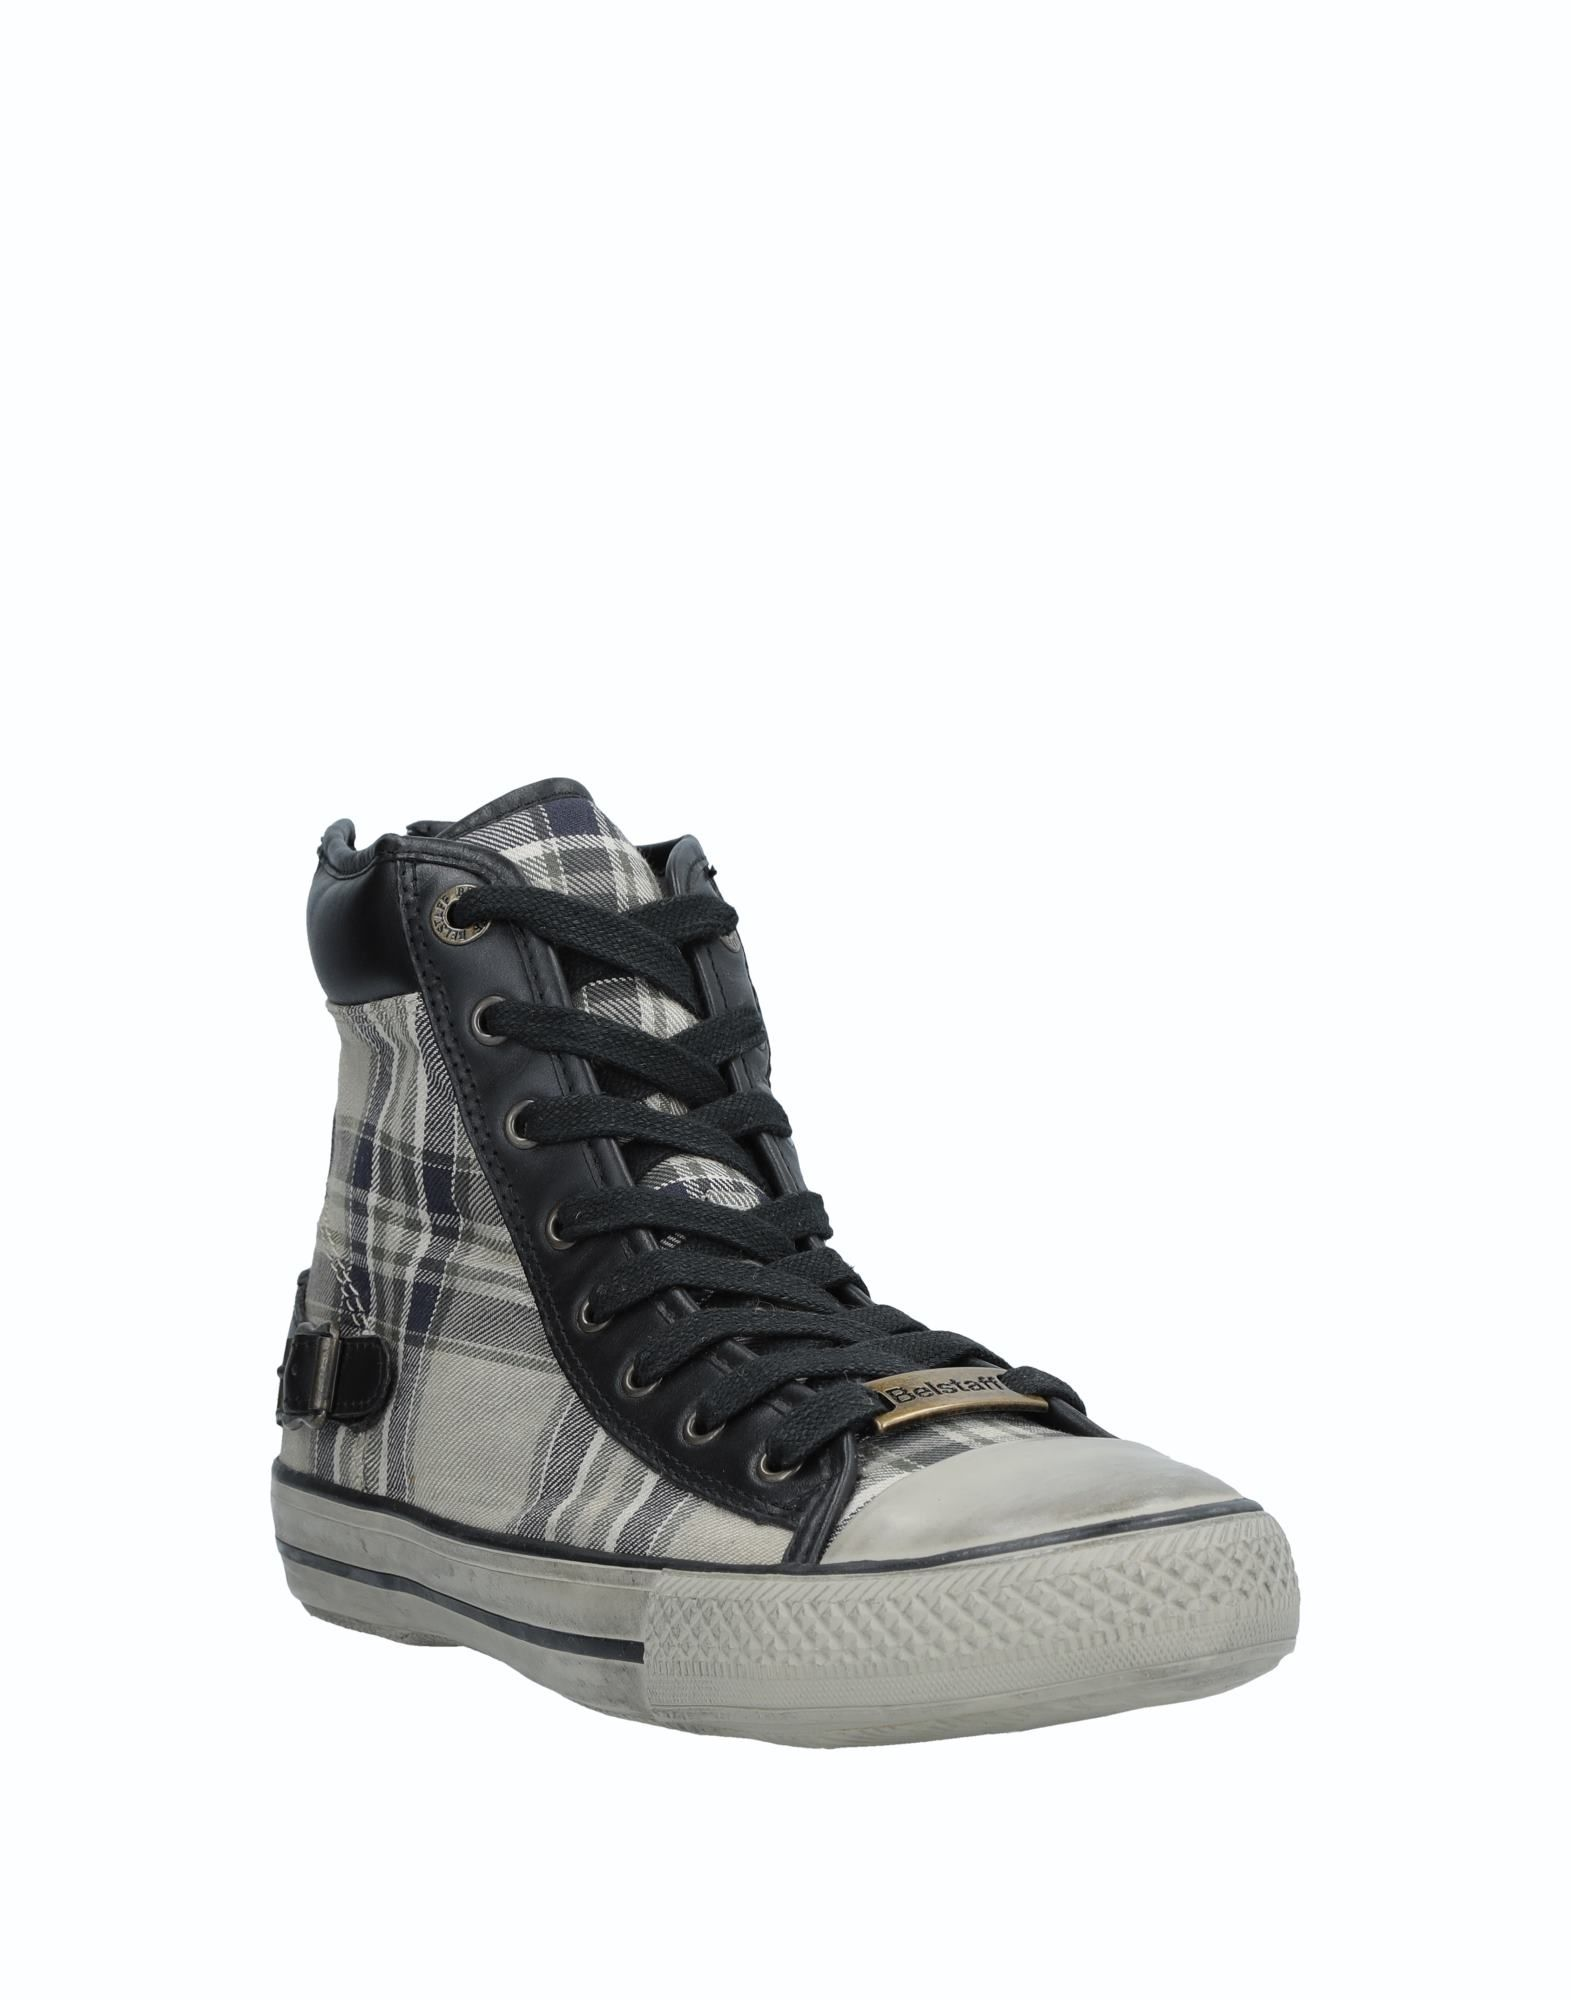 Stilvolle billige Schuhe 11536788FB Belstaff Sneakers Damen  11536788FB Schuhe 4de3f1